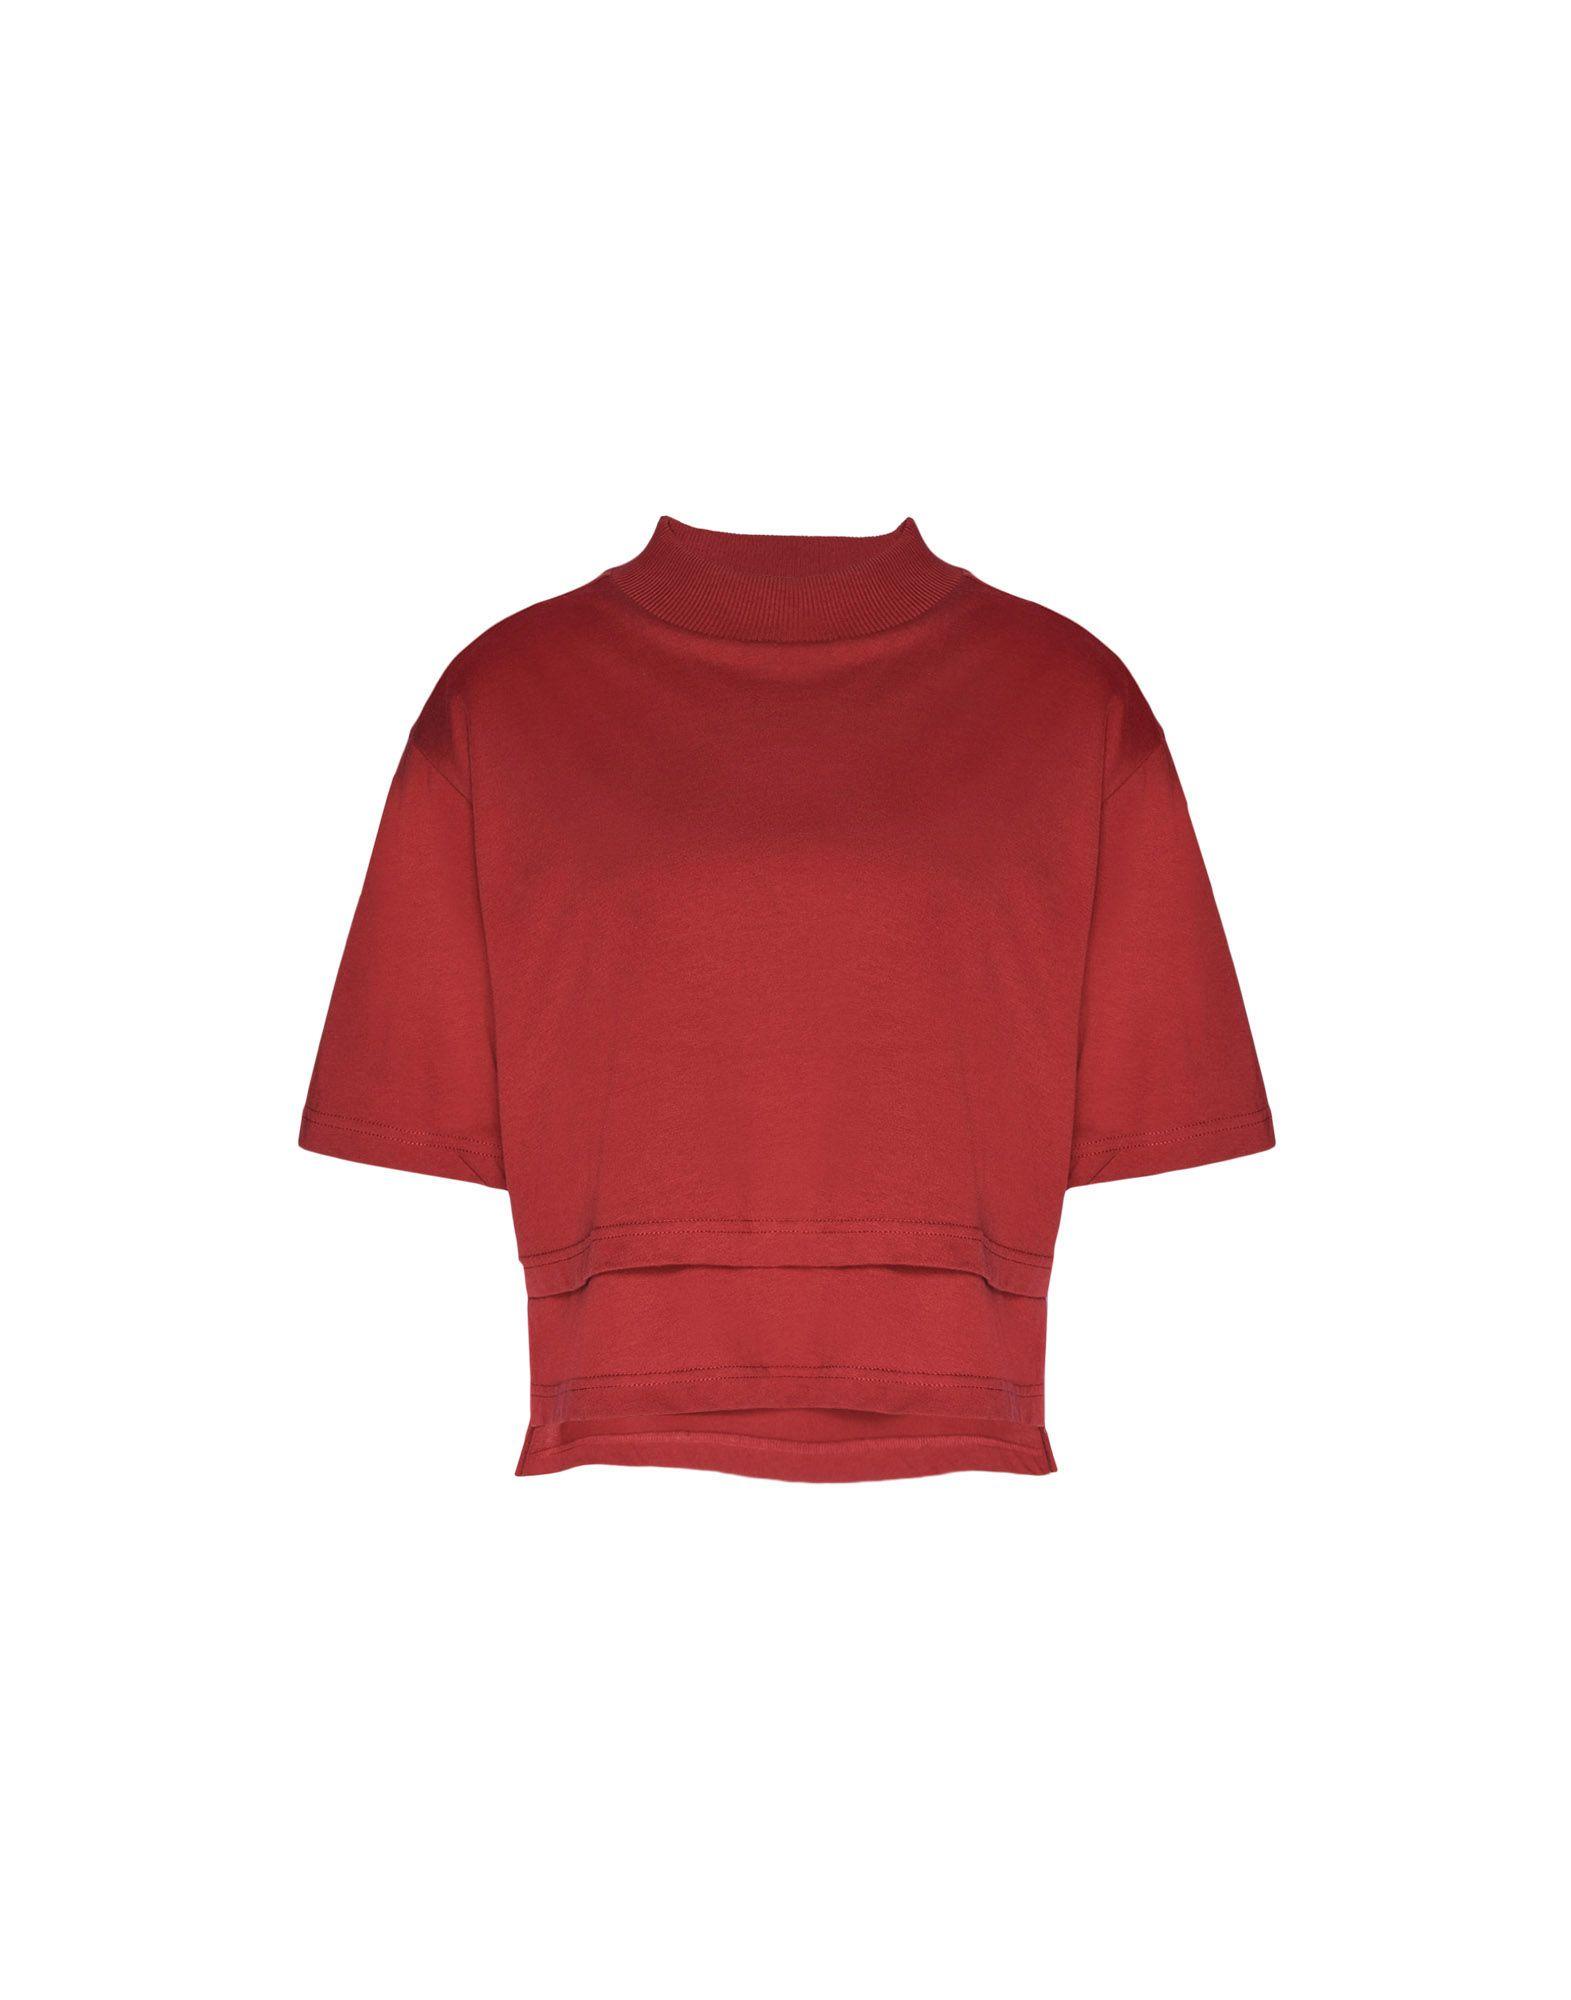 Y-3 Y-3 Signature Long Tee Short sleeve t-shirt Woman f